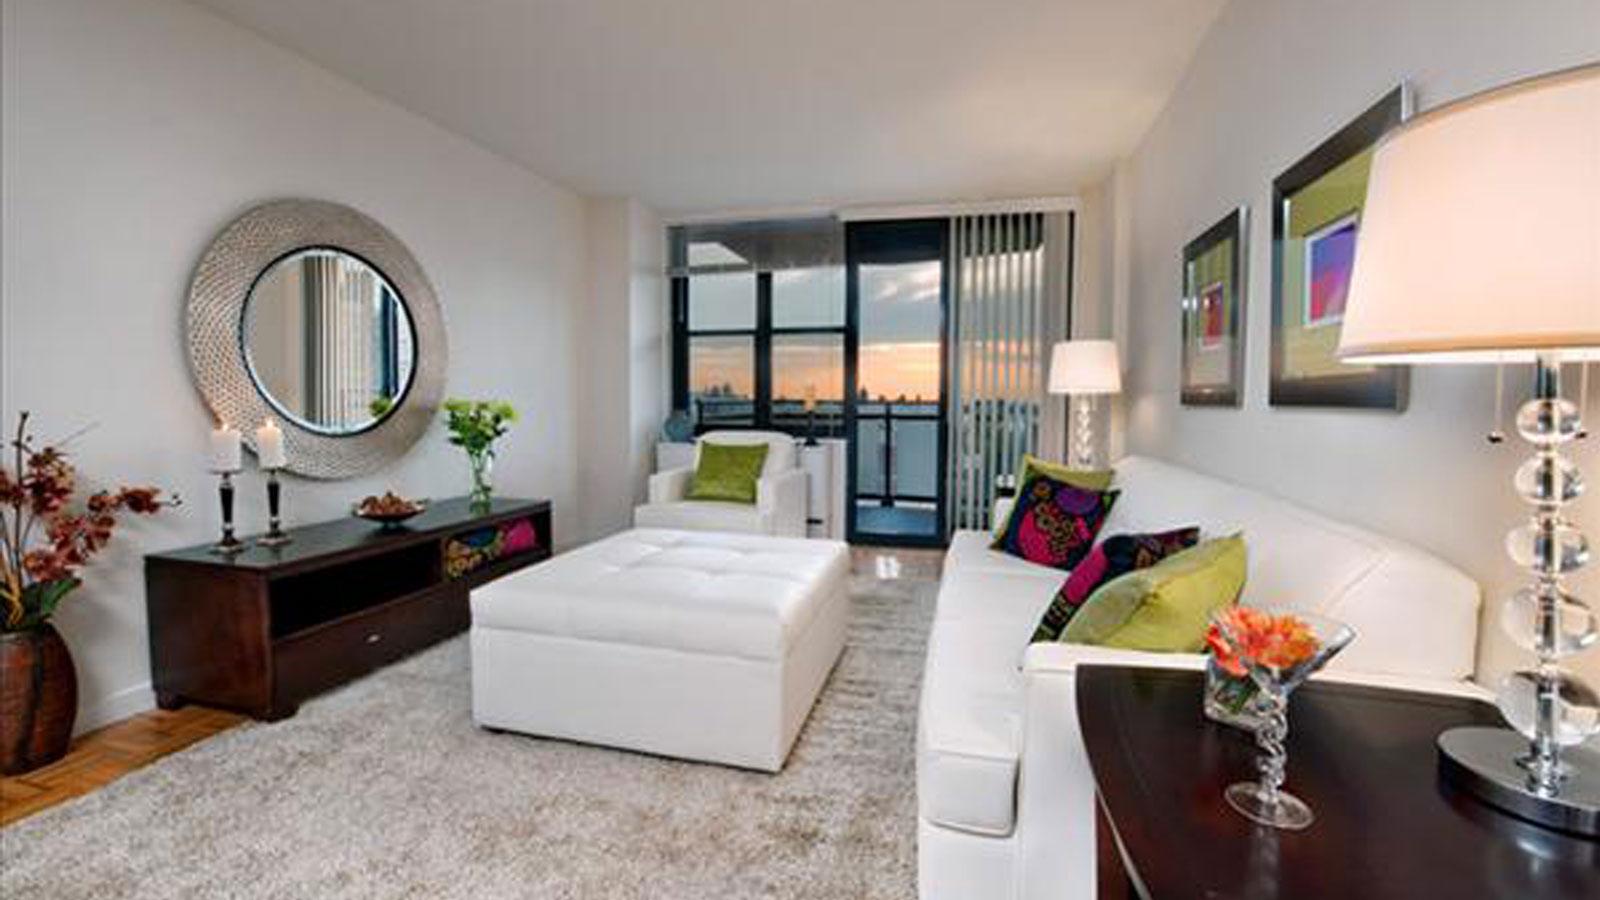 303 East 83rd Street Nyc Rental Apartments Cityrealty